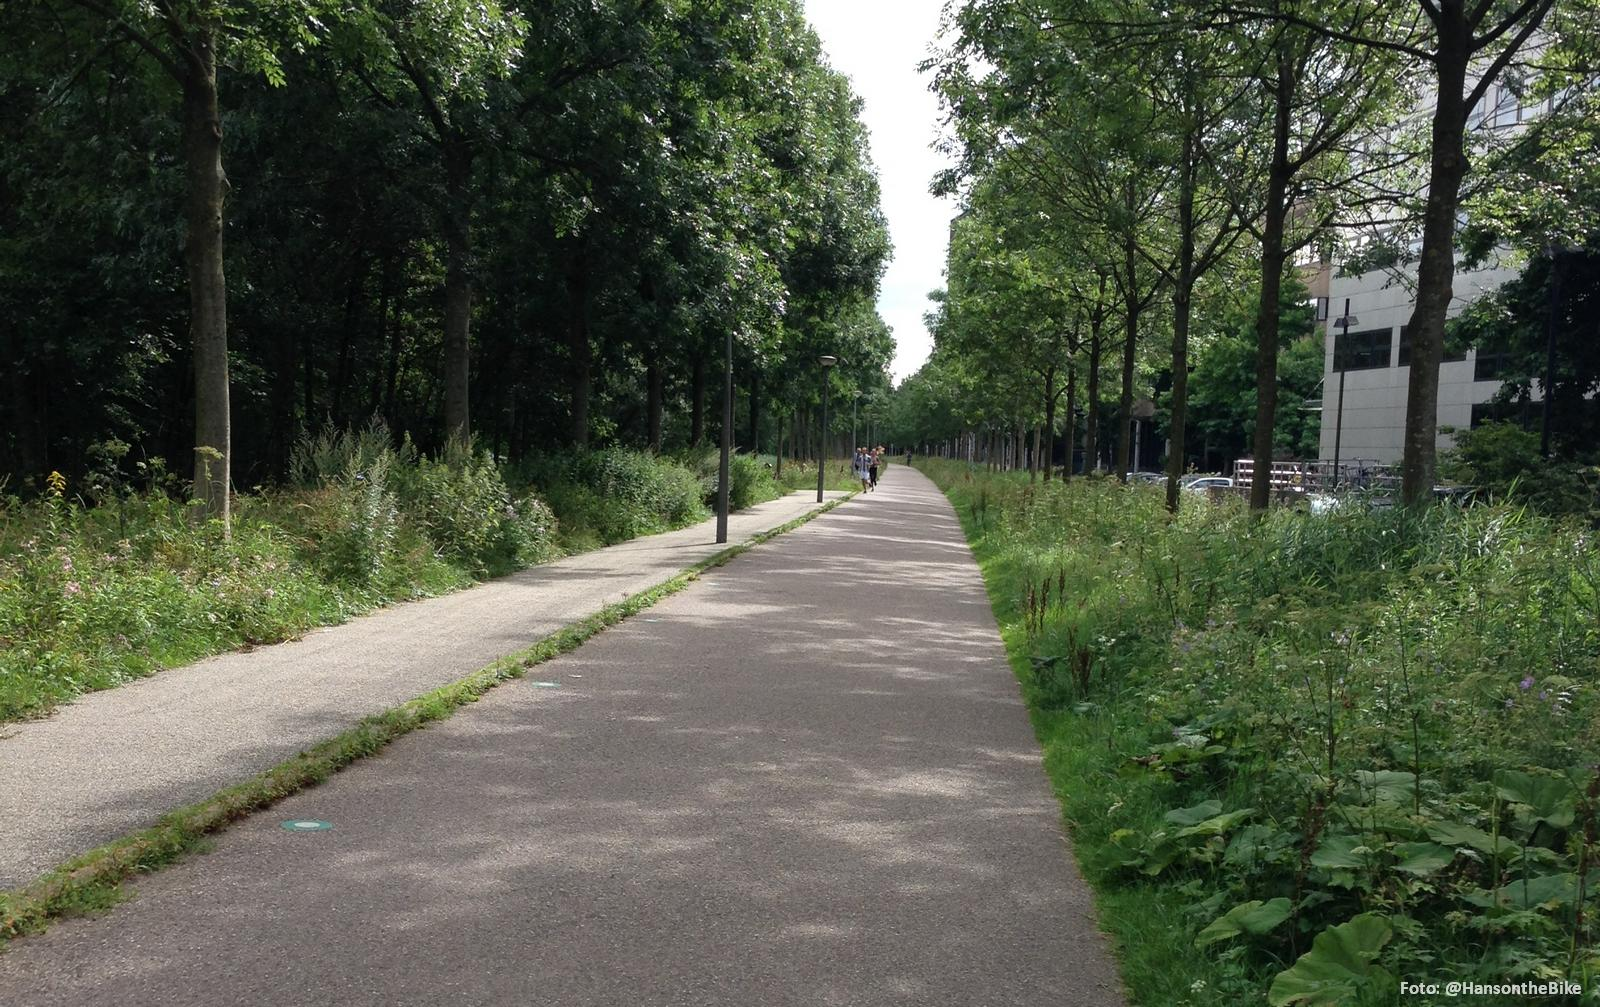 amsterdam-hansonthebike-02